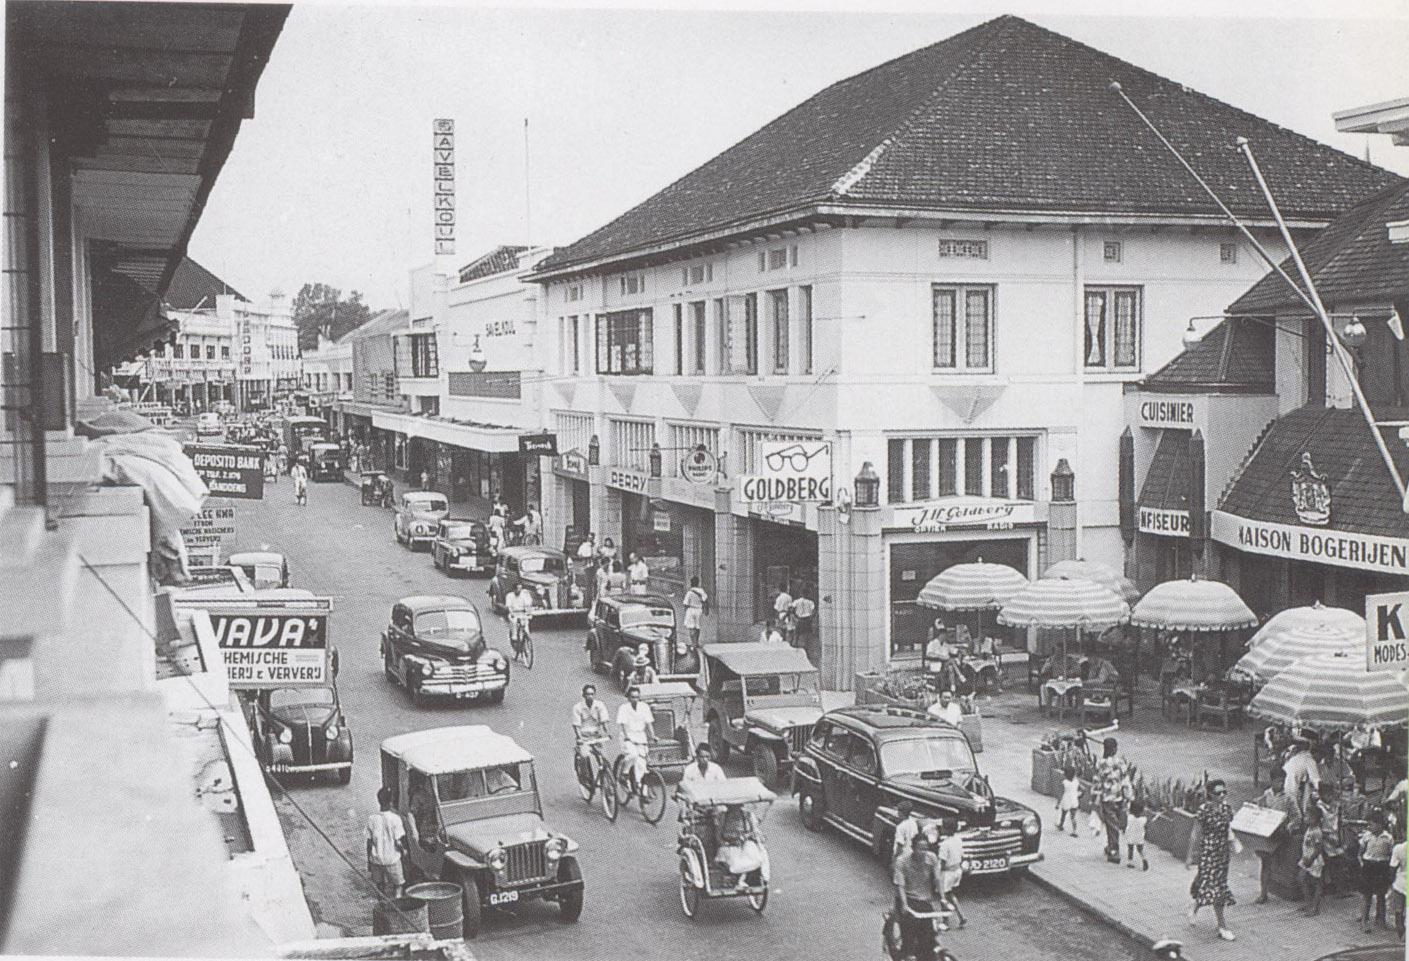 Bandung Tempo Doeloe Foto Jadul Euy Ganzzssparrow Gedung Merdeka Thn